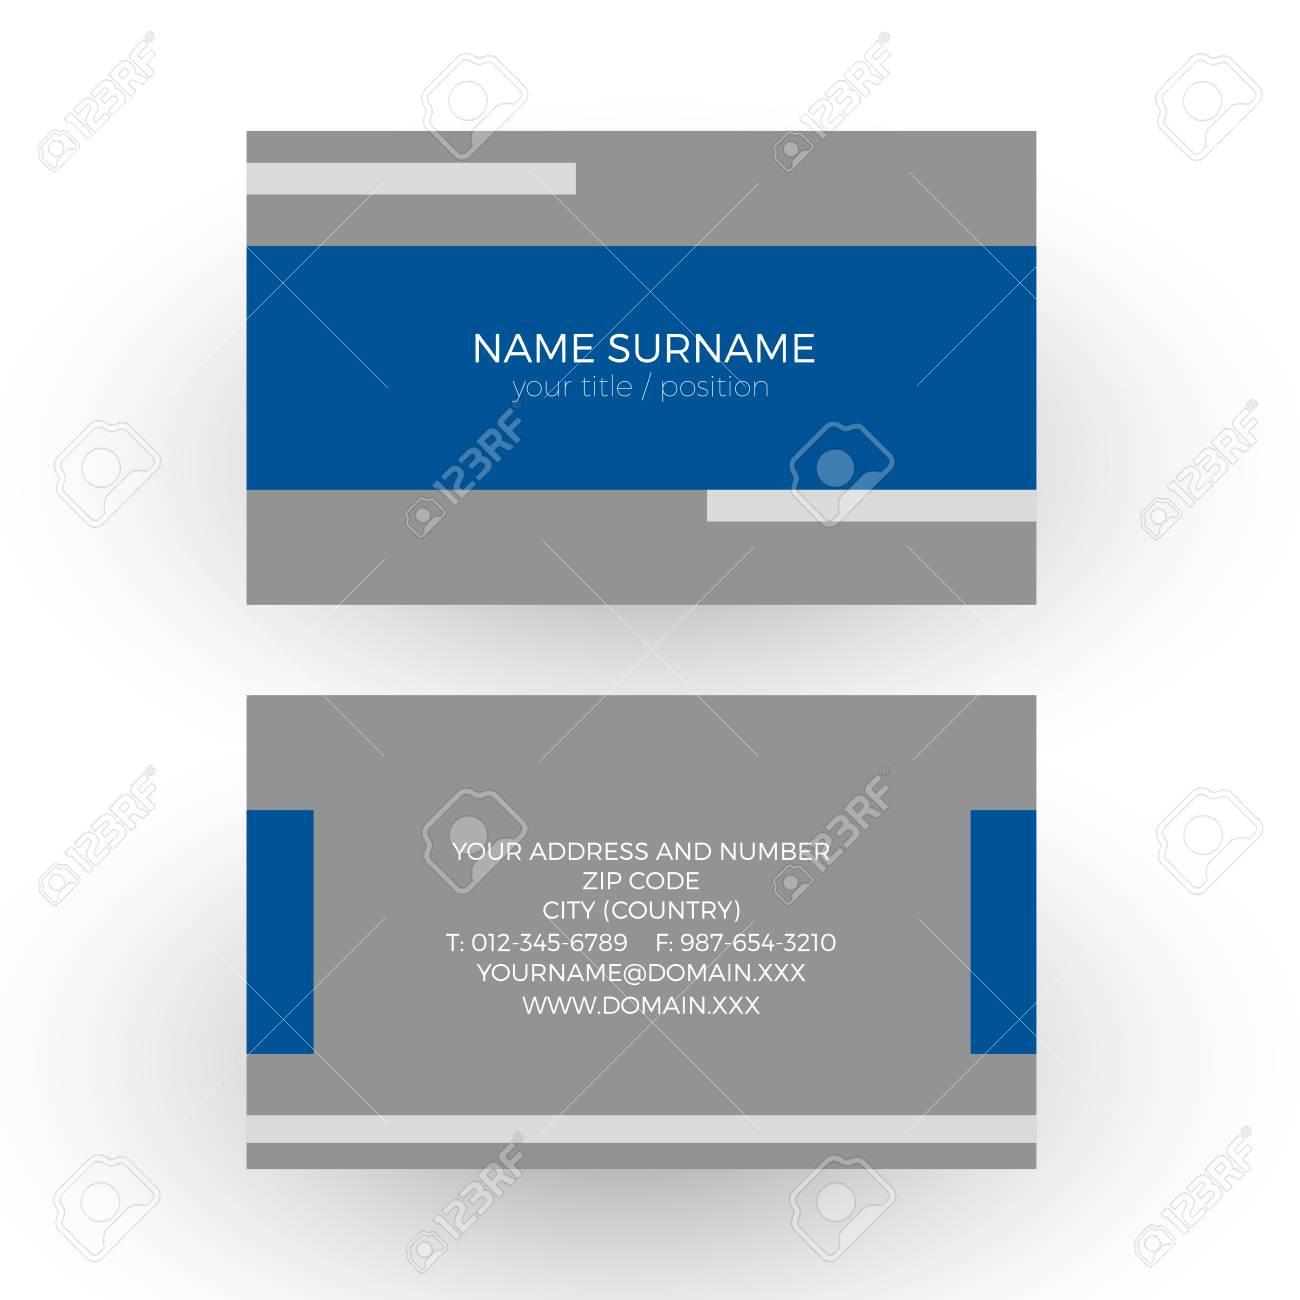 Vector Fond Bleu Geometrique Minimal Avec Du Ruban Adhesif Carte De